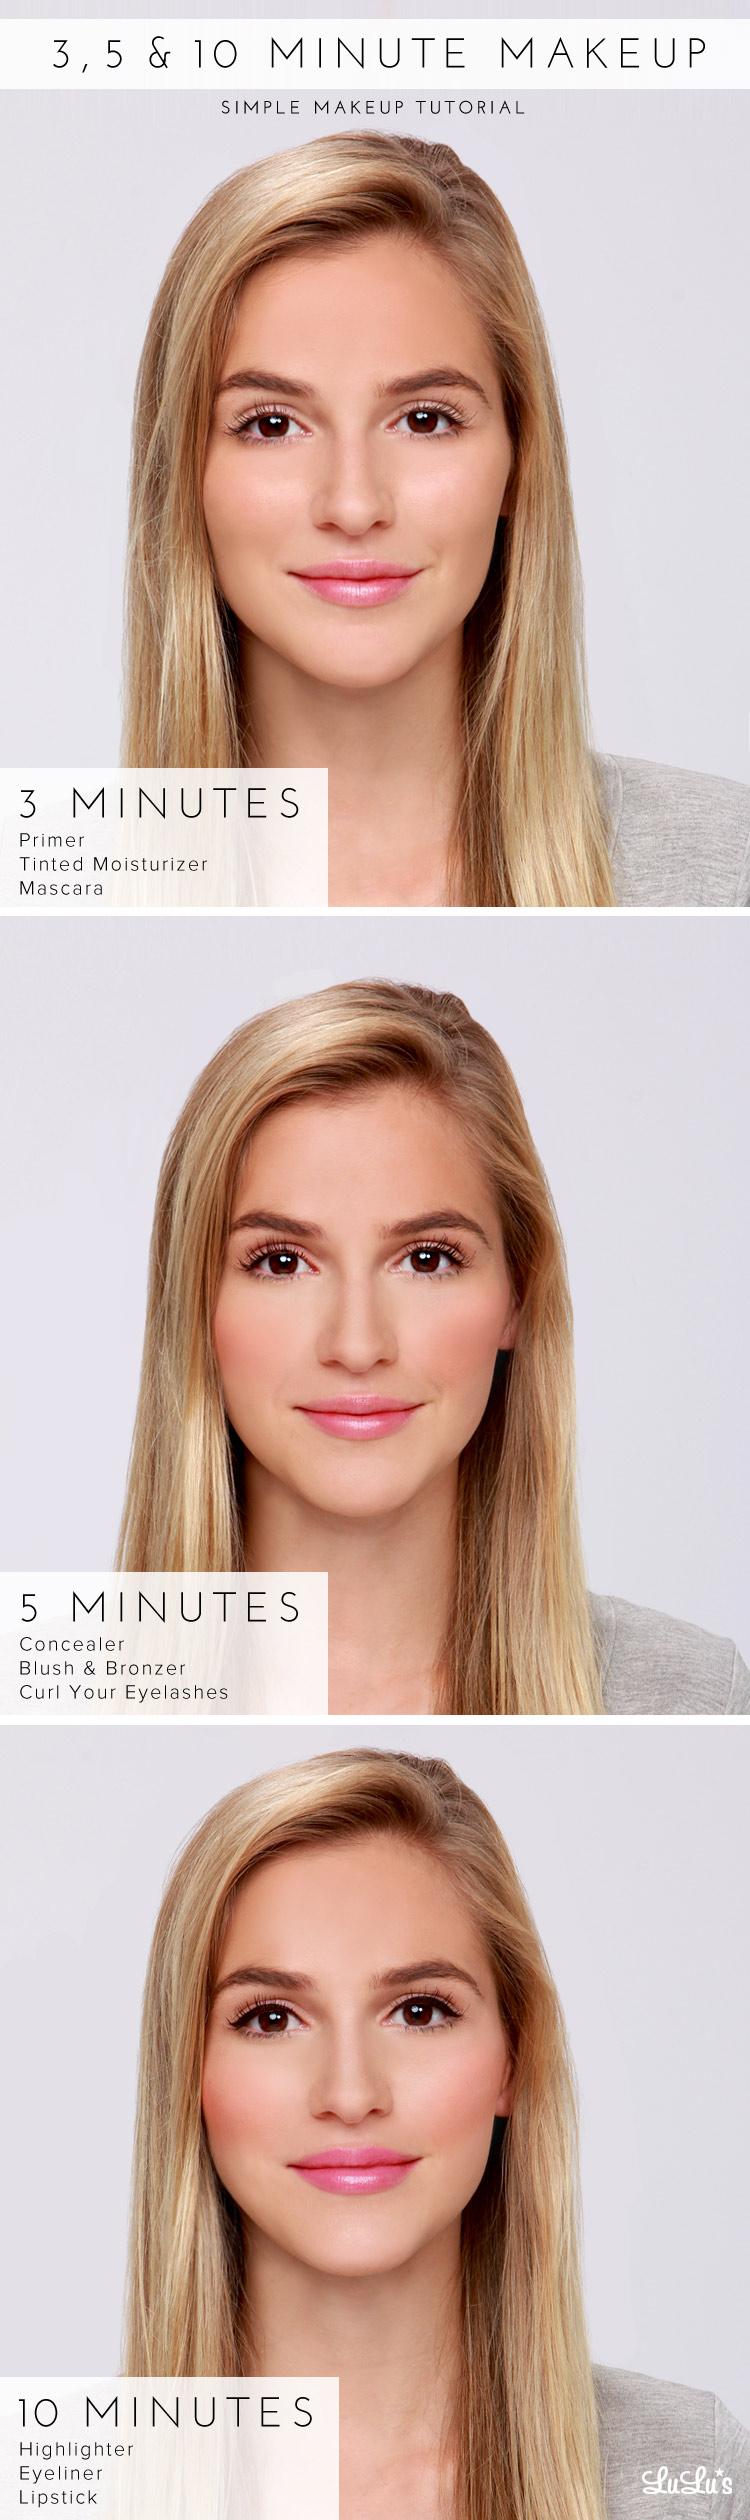 Lulus How-To: 12, 12 & 12 Minute Makeup Tutorial - Lulus.com Fashion